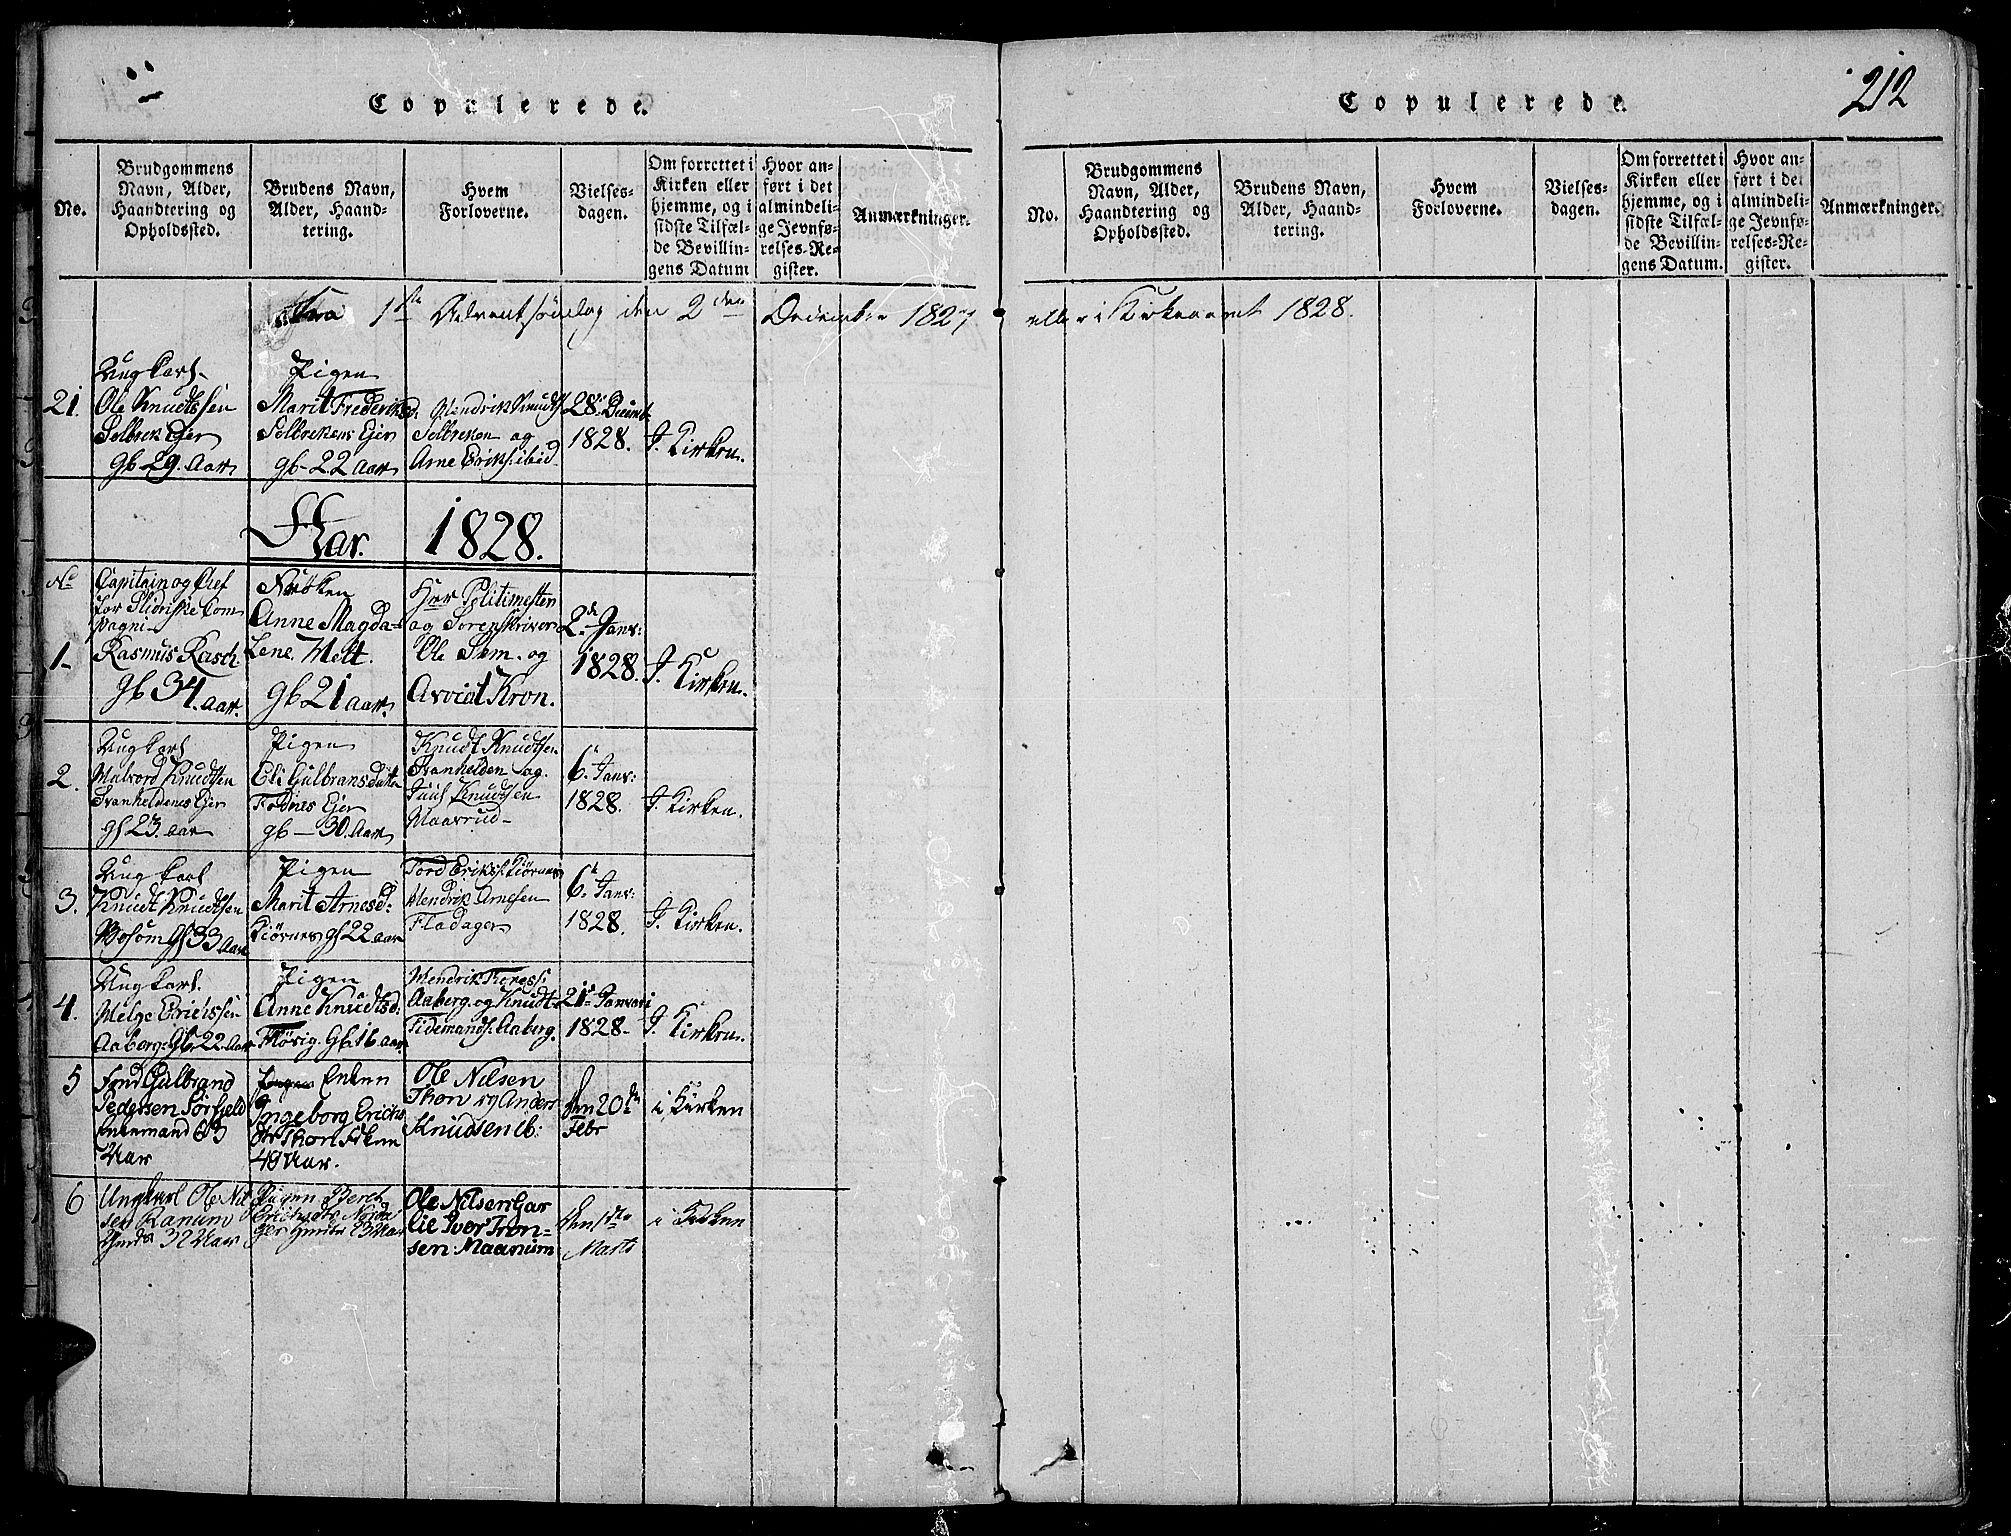 SAH, Nord-Aurdal prestekontor, Ministerialbok nr. 2, 1816-1828, s. 212